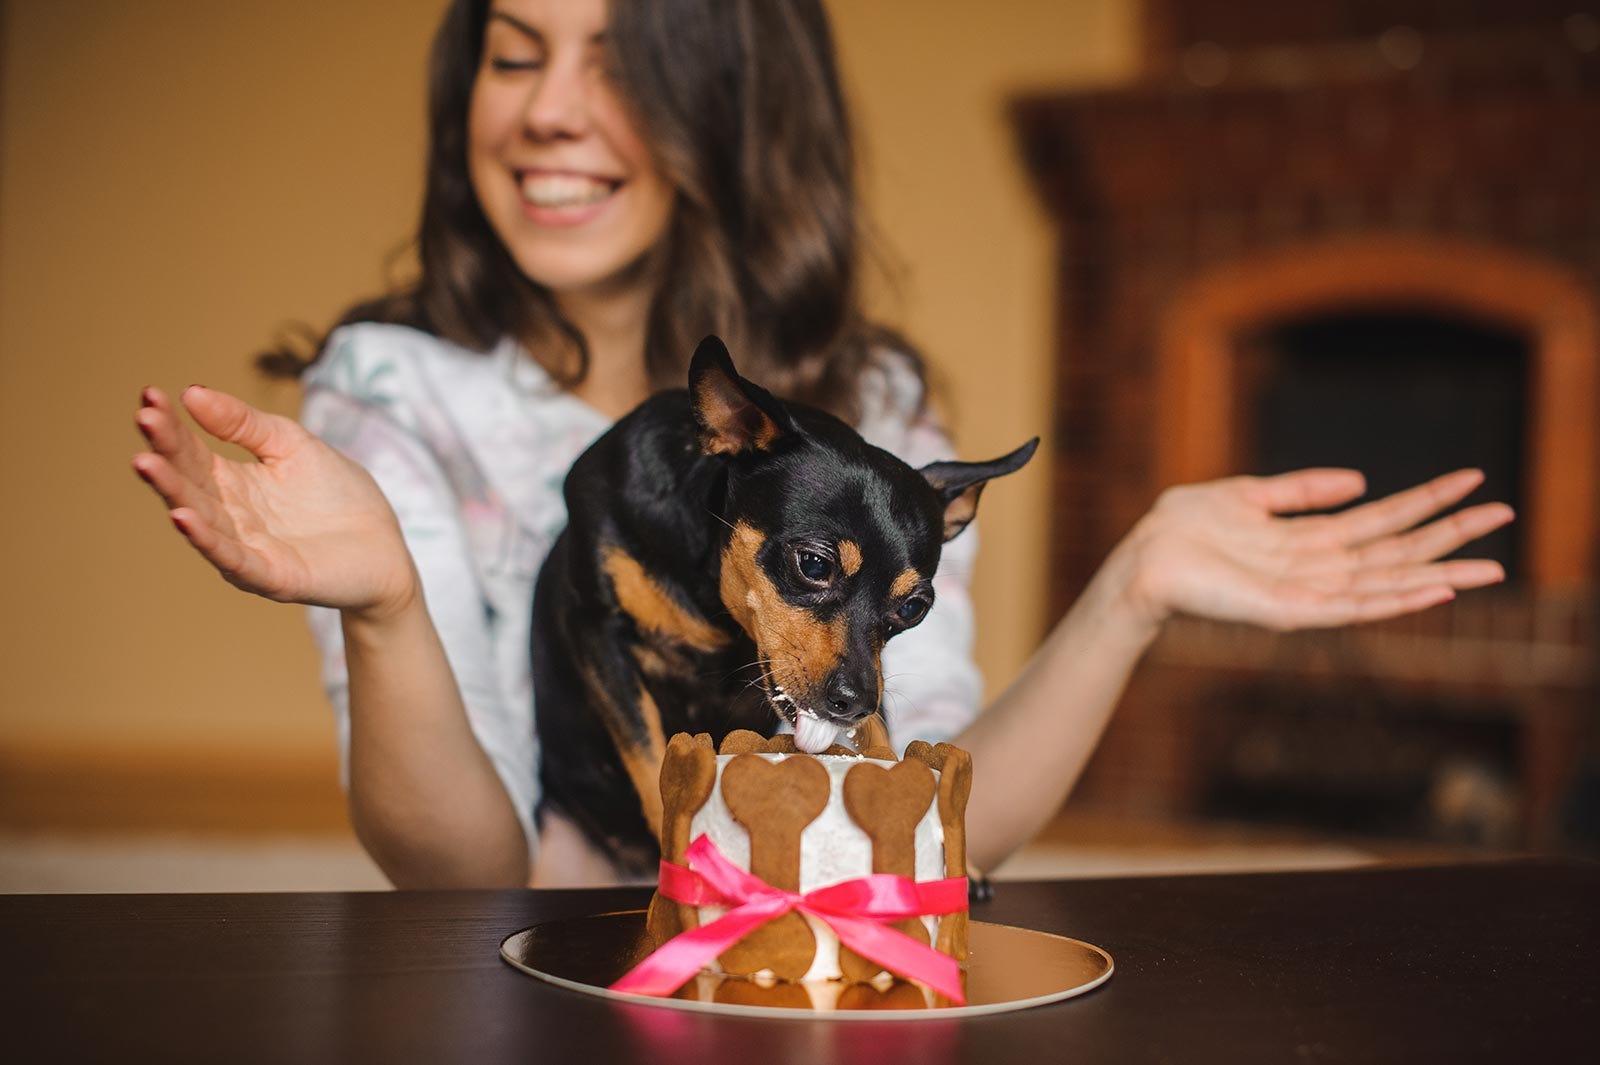 Dog eating a dog-friendly birthday cake.